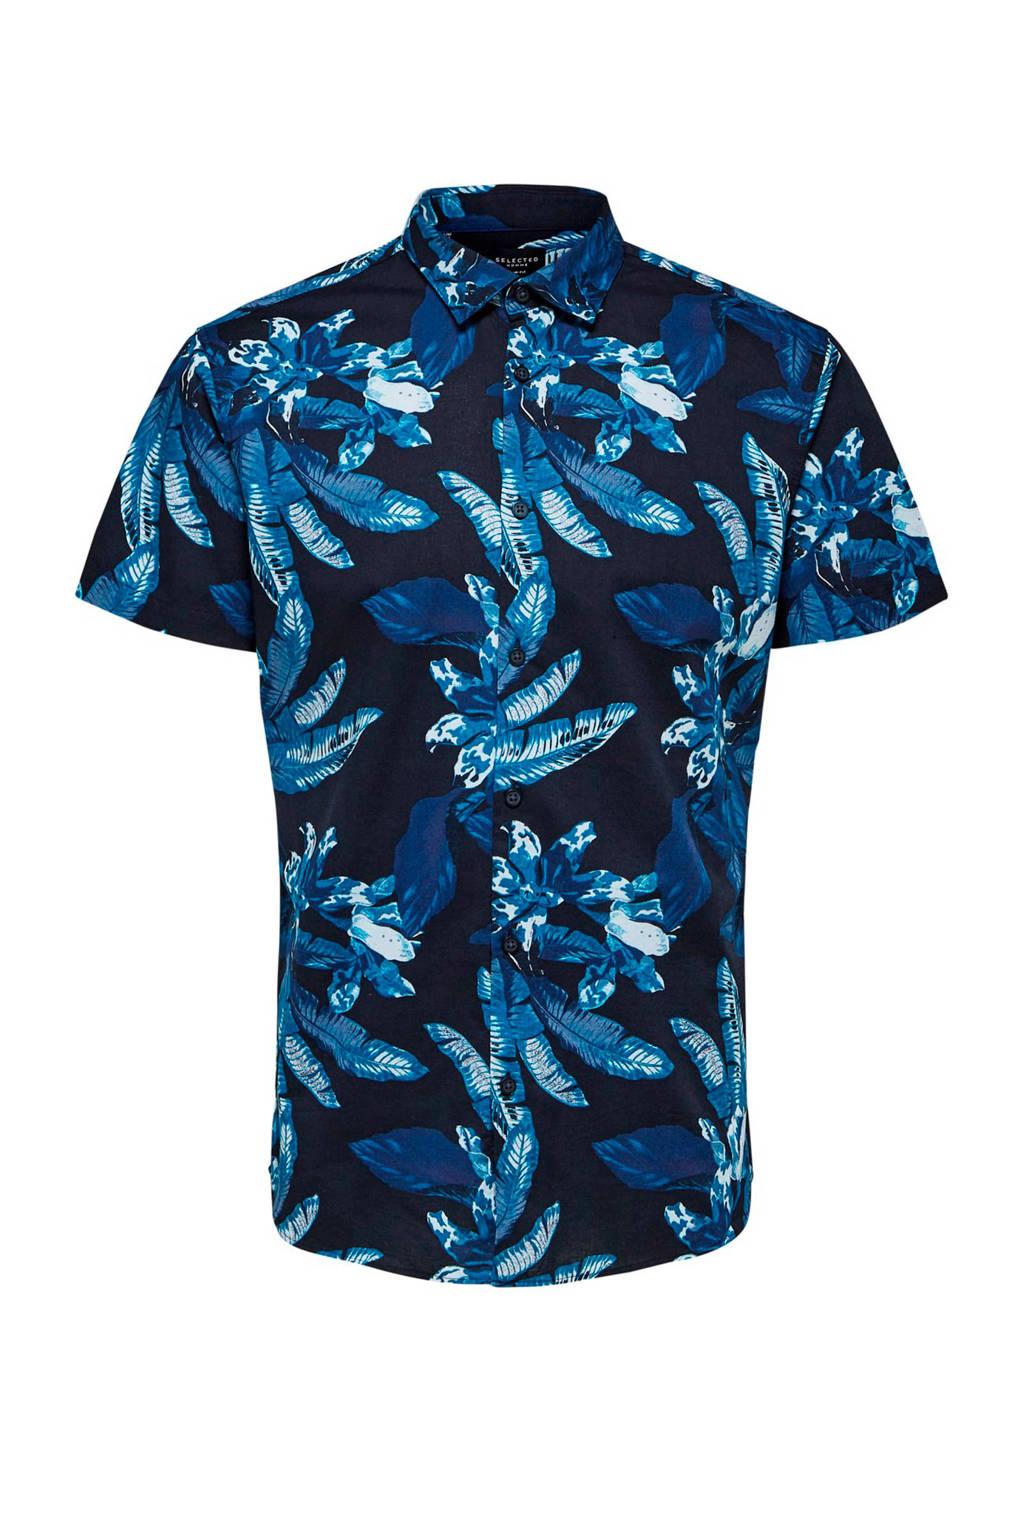 SELECTED HOMME overhemd, Zwart/blauw